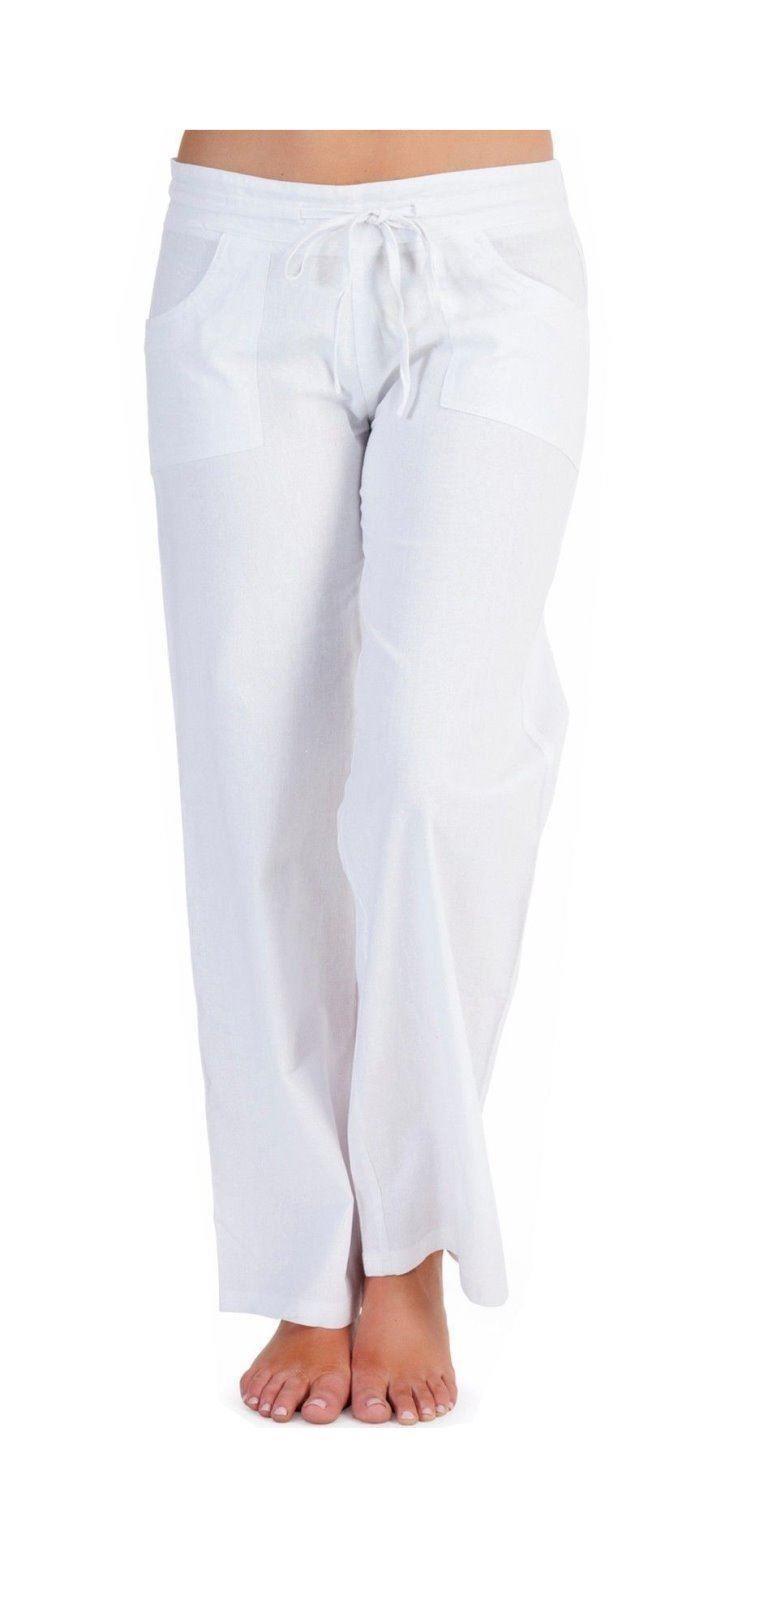 Excellent Women Sealmax Sports Loose Workout Fitting Yoga U0026 Gym Pants | EBay